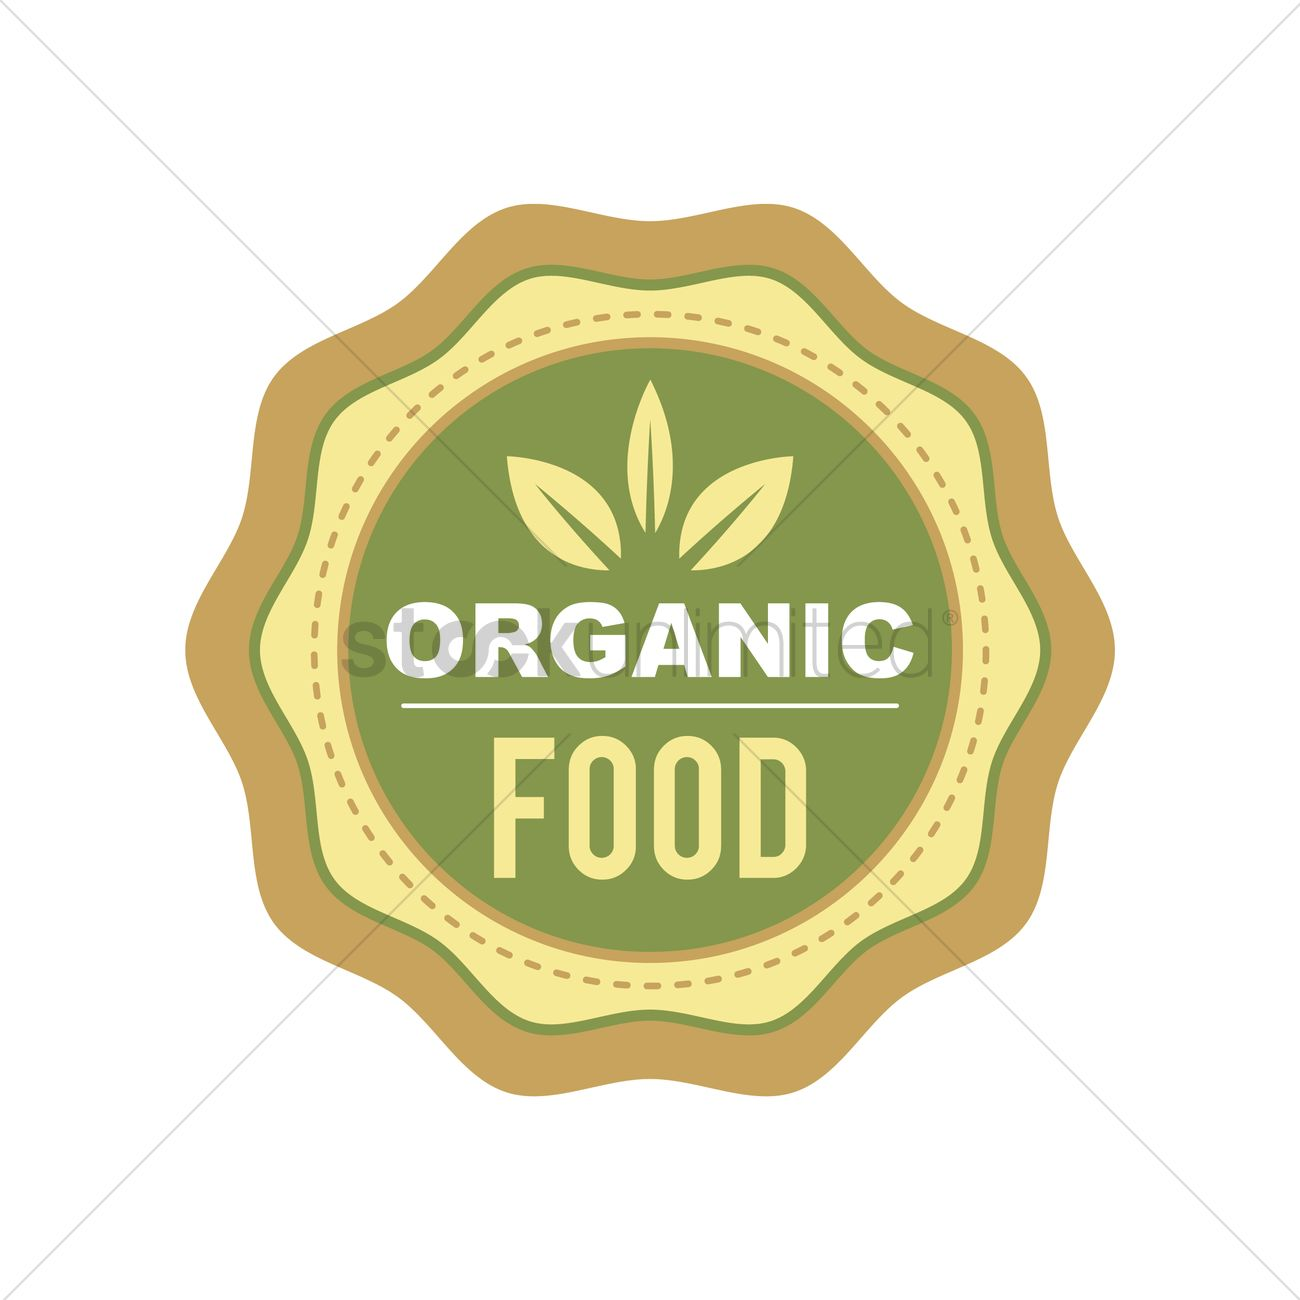 Organic food label design Vector Image - 2029872